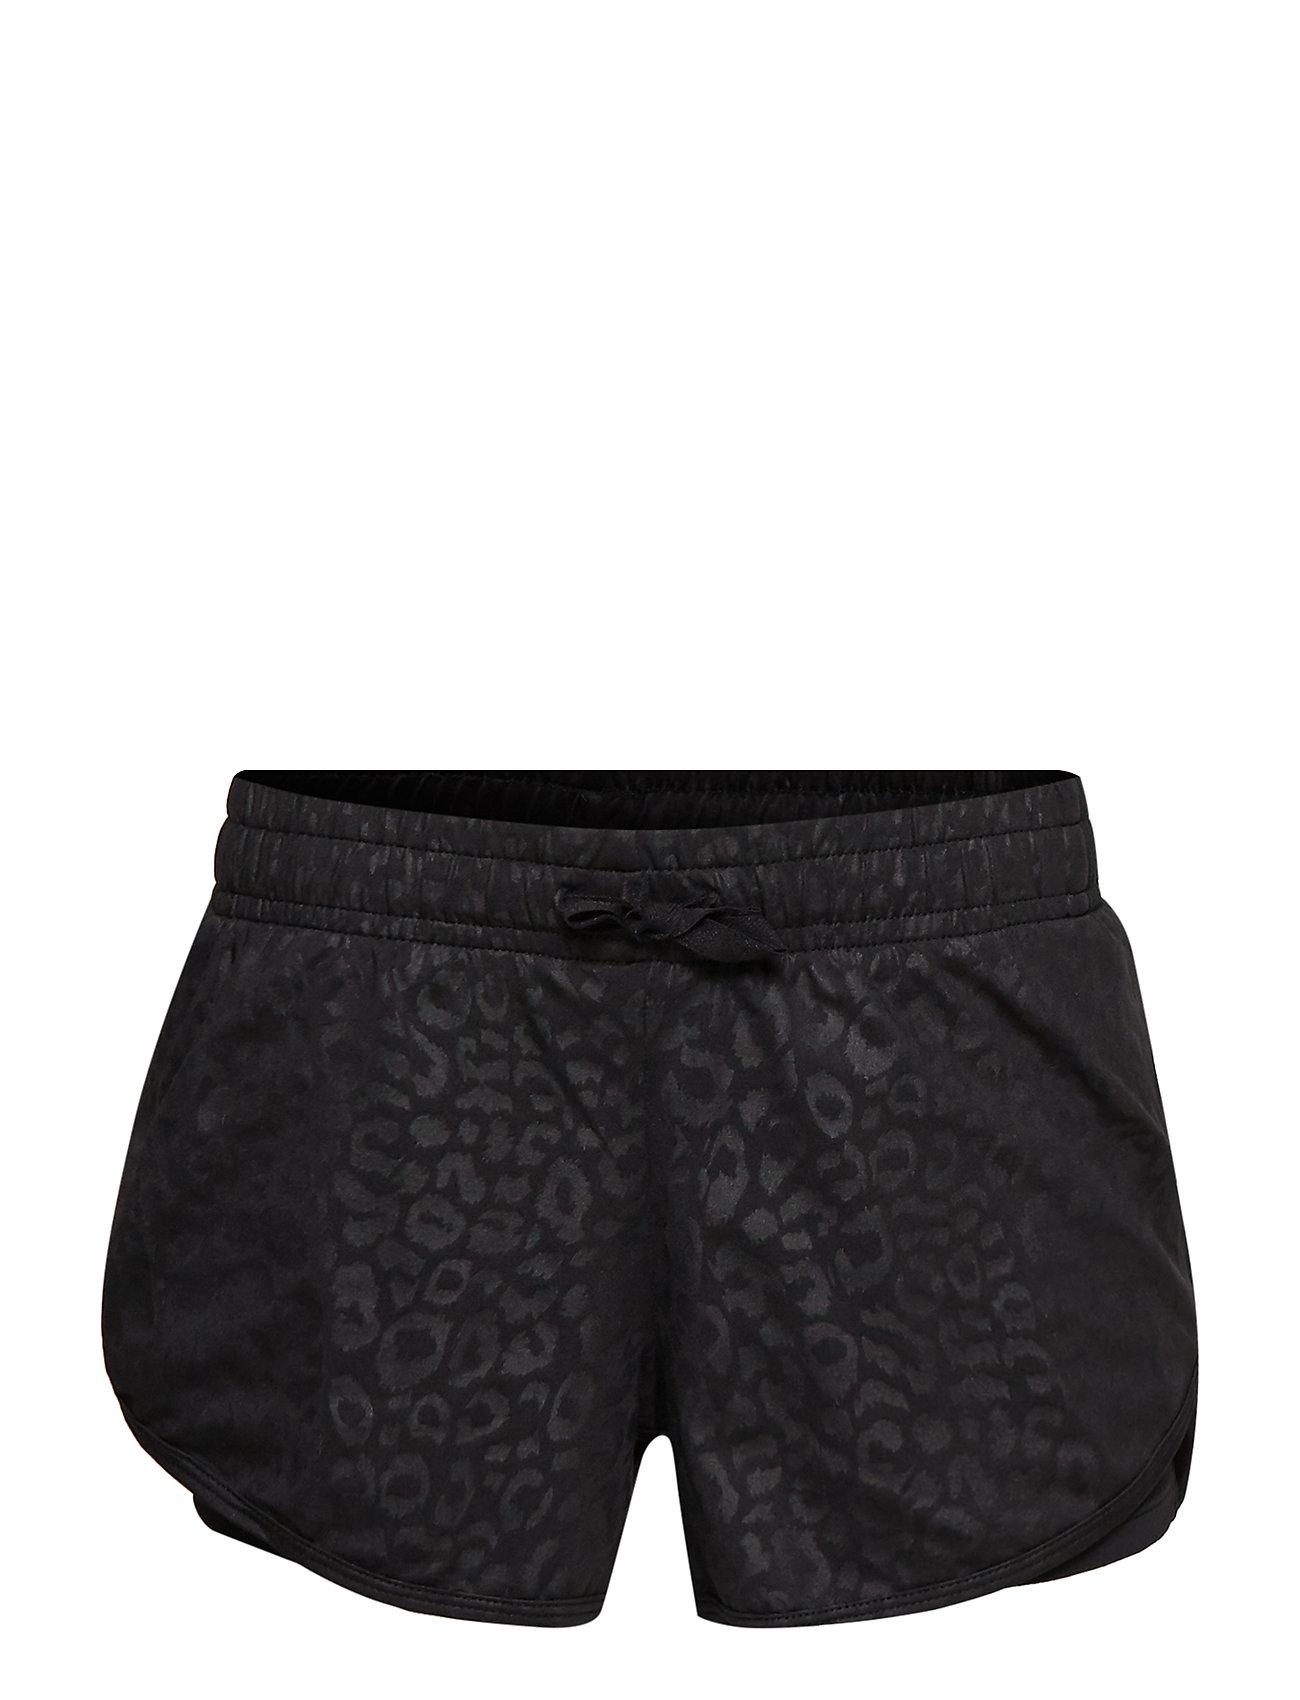 Image of Pure Leo Shorts (3126194299)